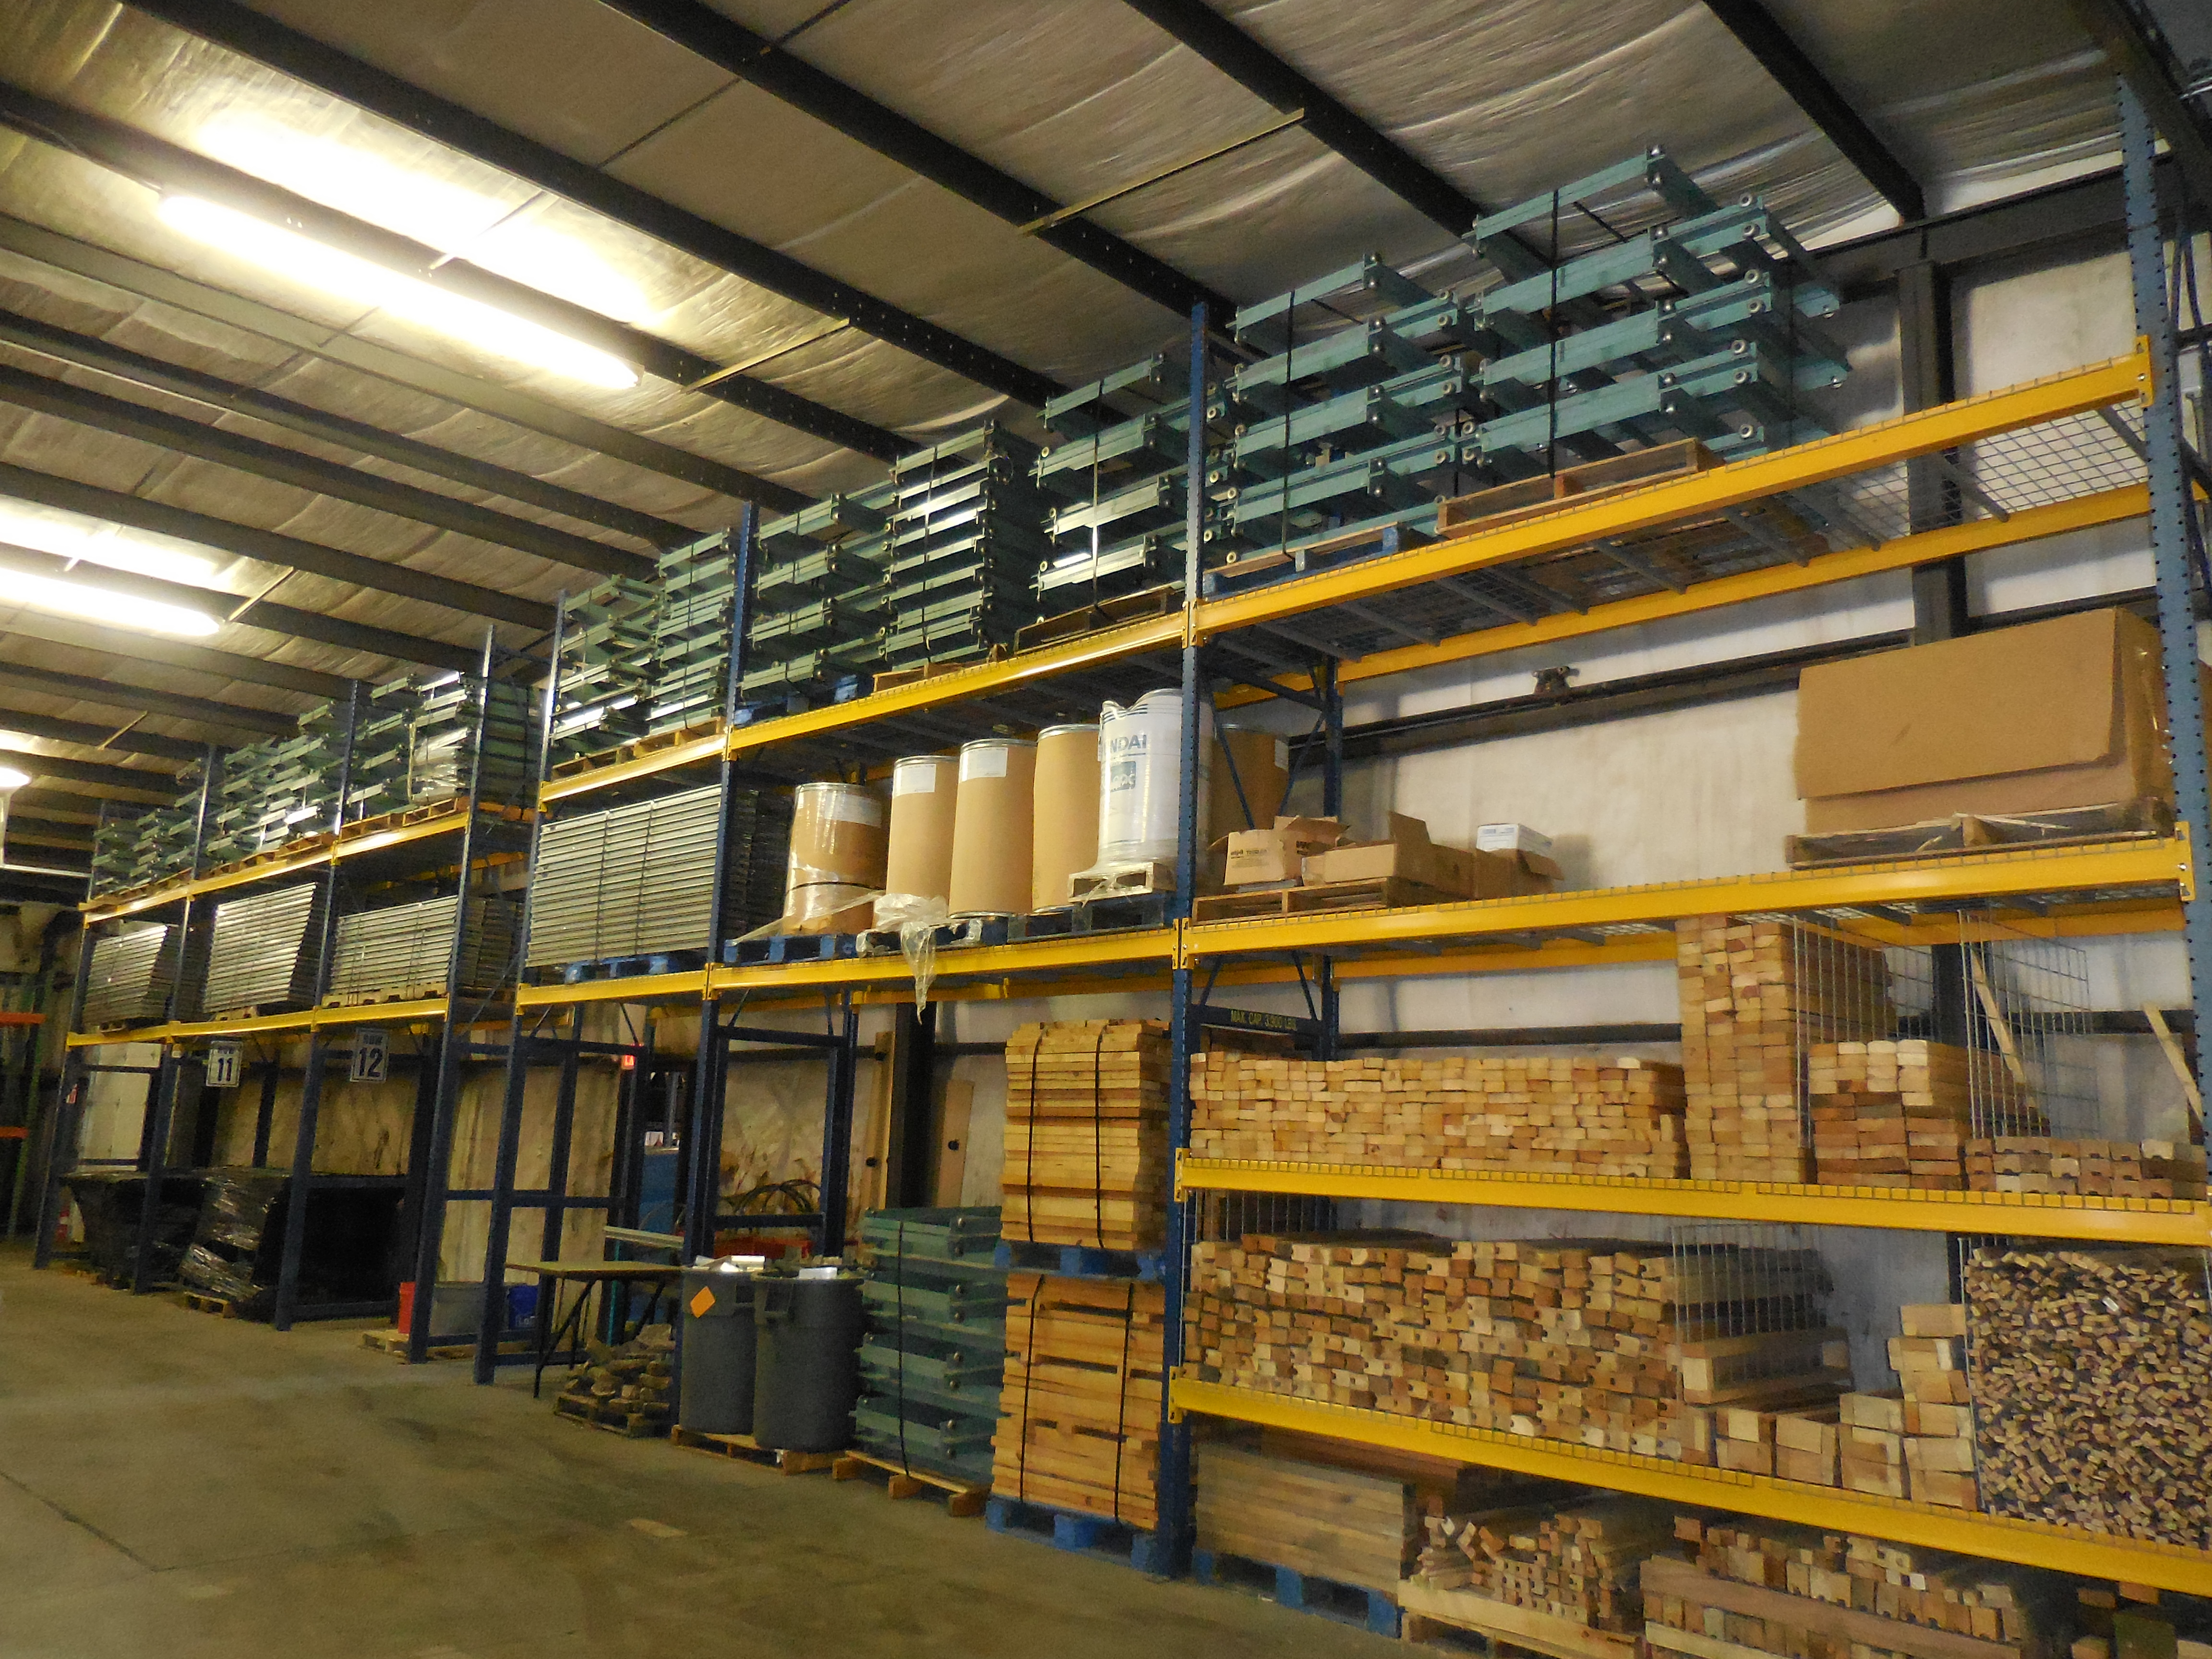 Our Facility Warehouse Design